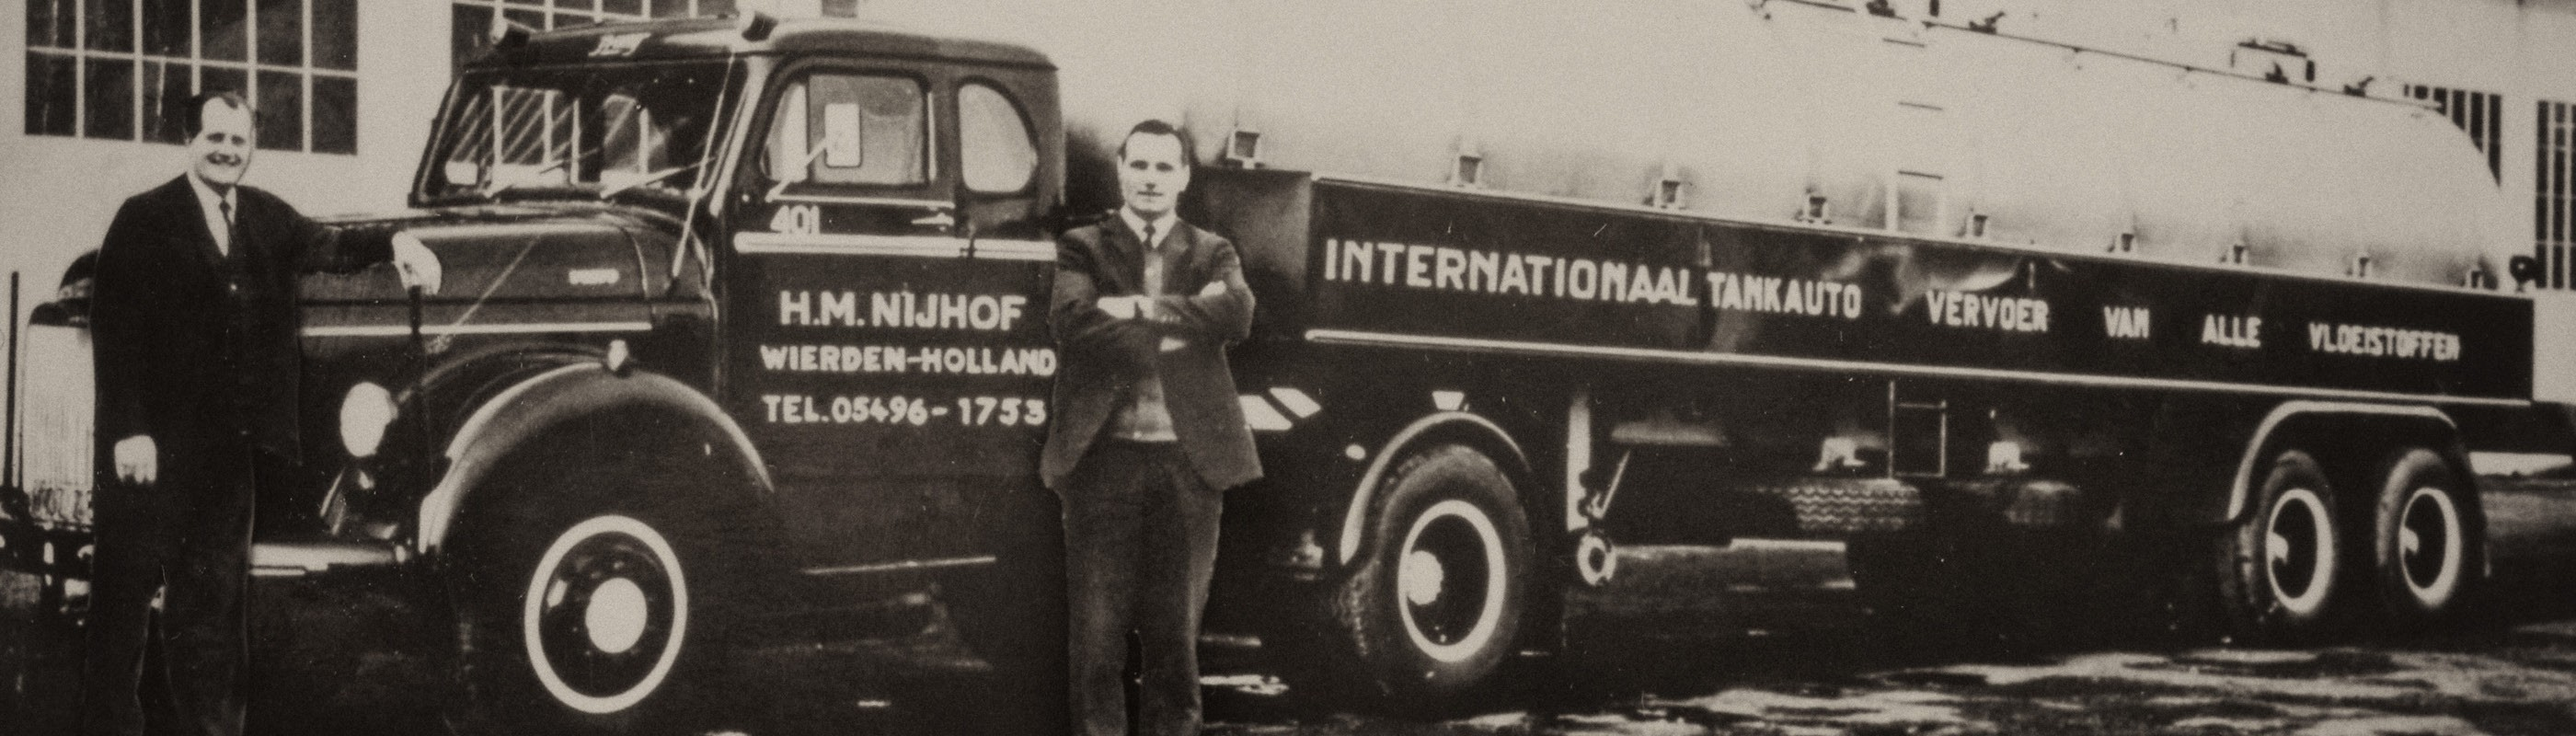 1966-